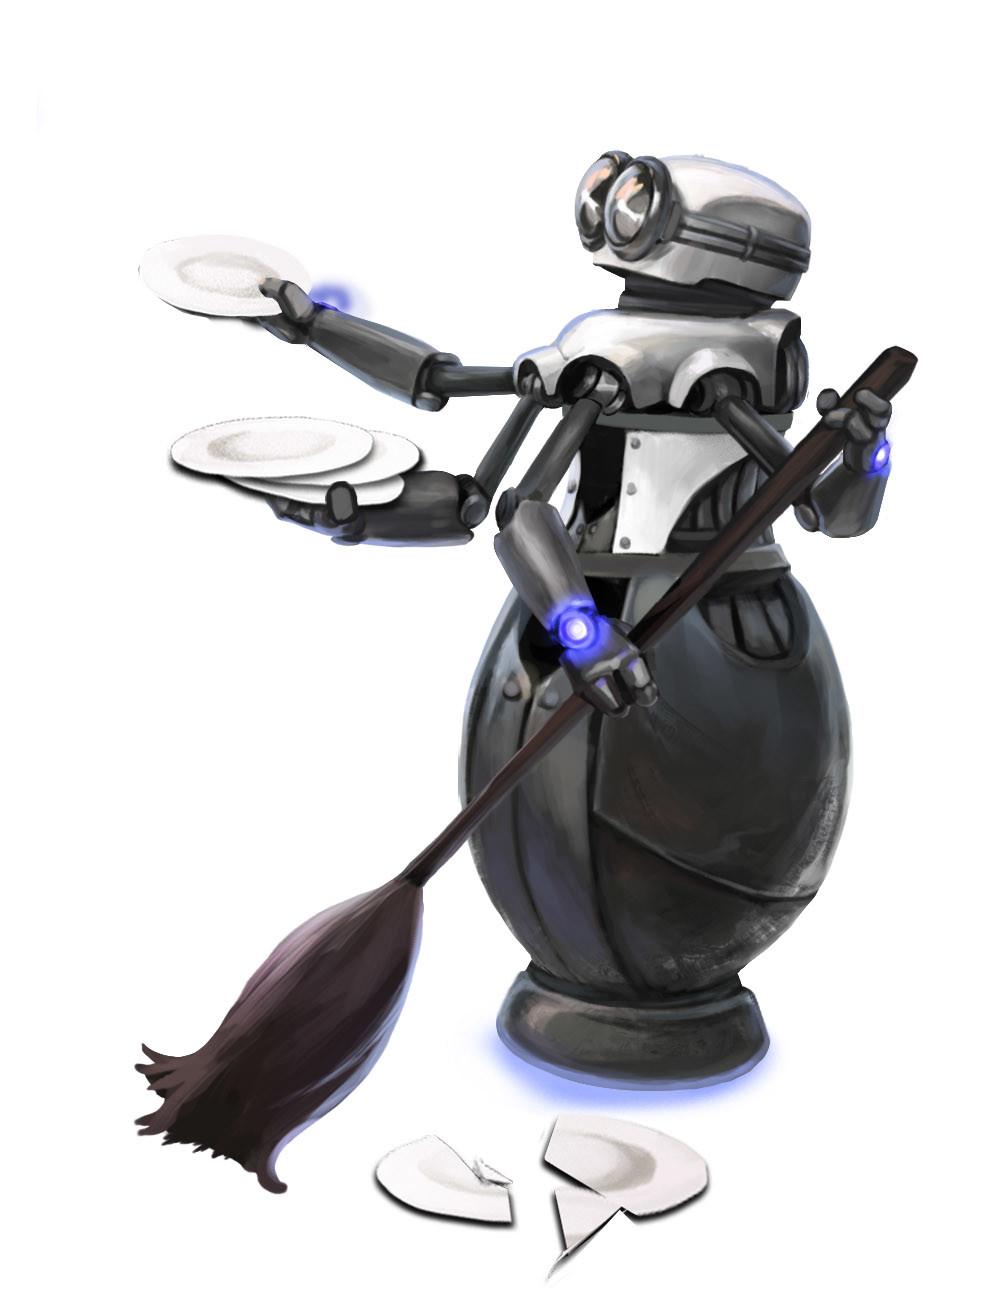 Philip hogg robot butler01